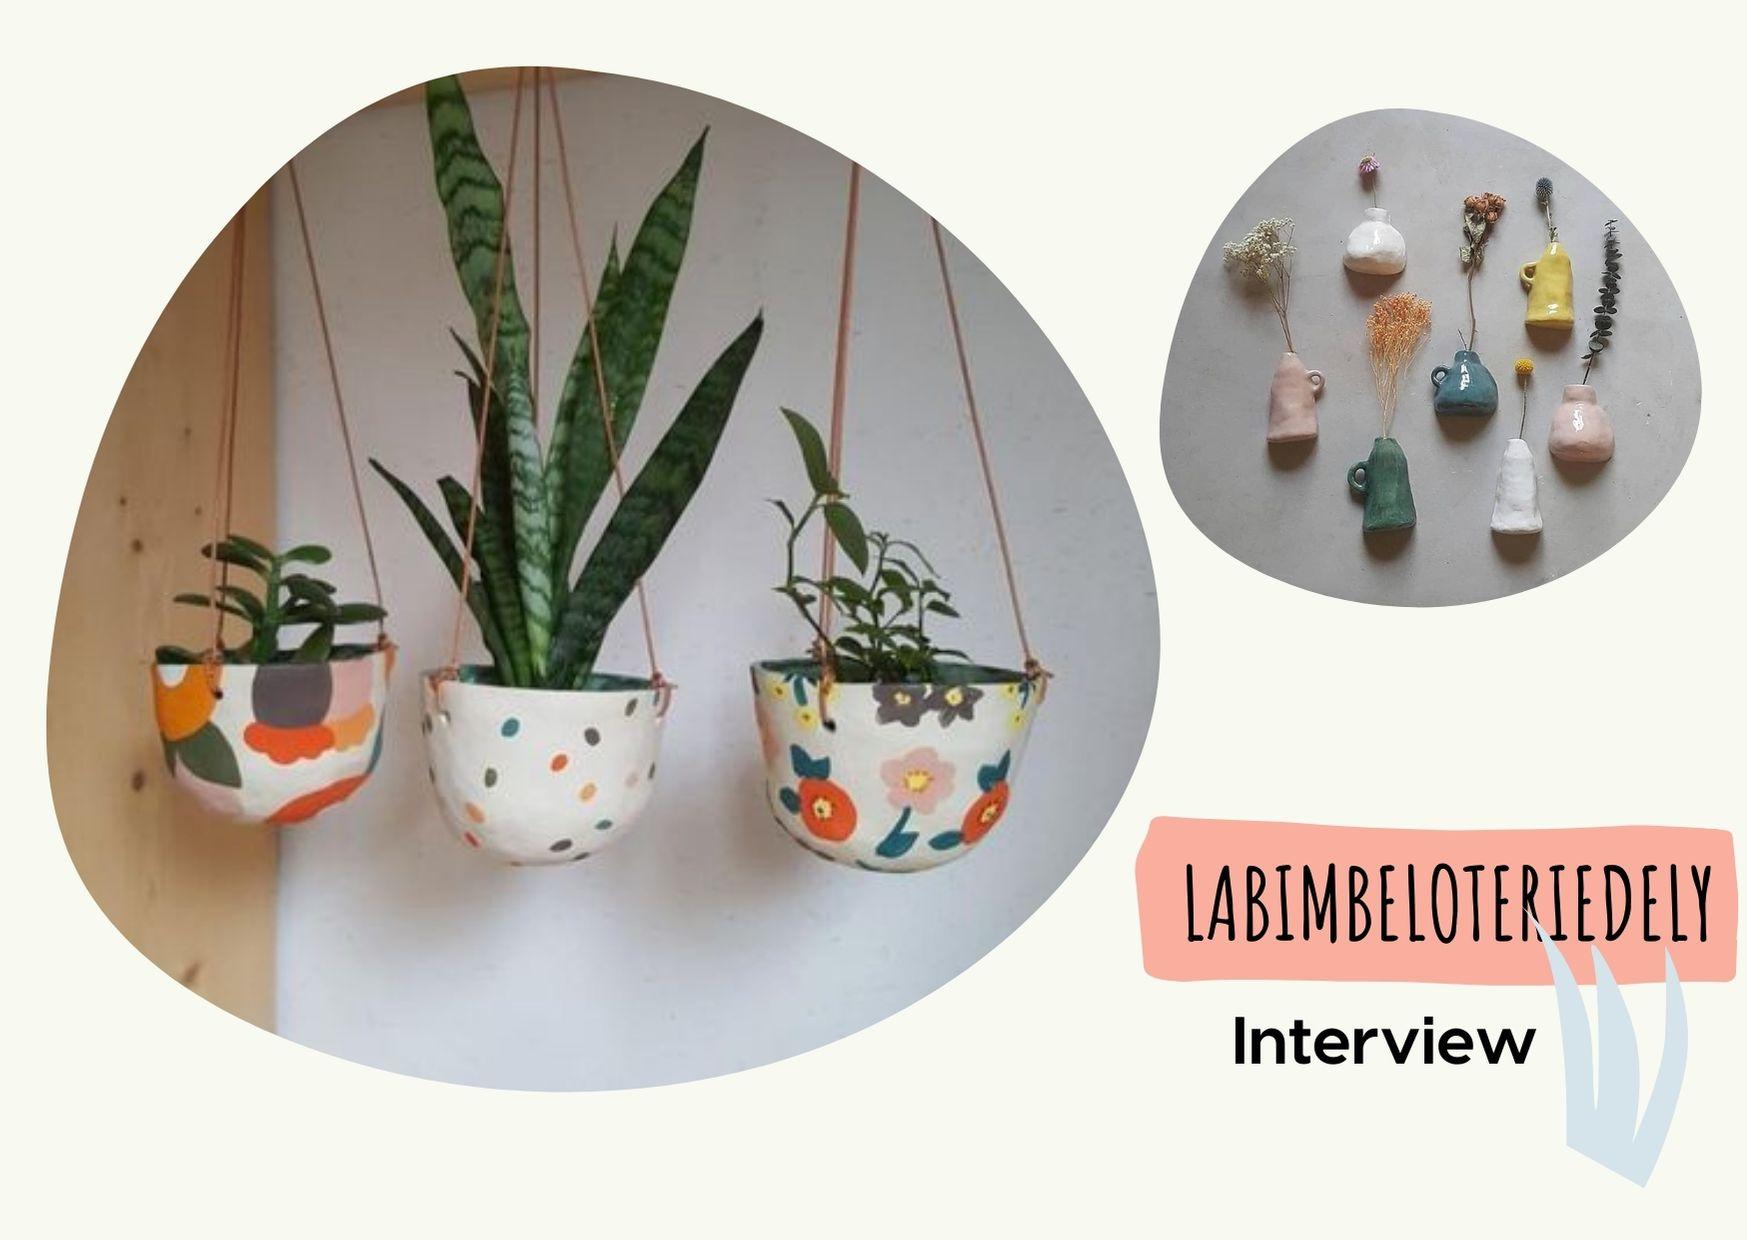 Interview créatrice céramiste labimbeloteriedely